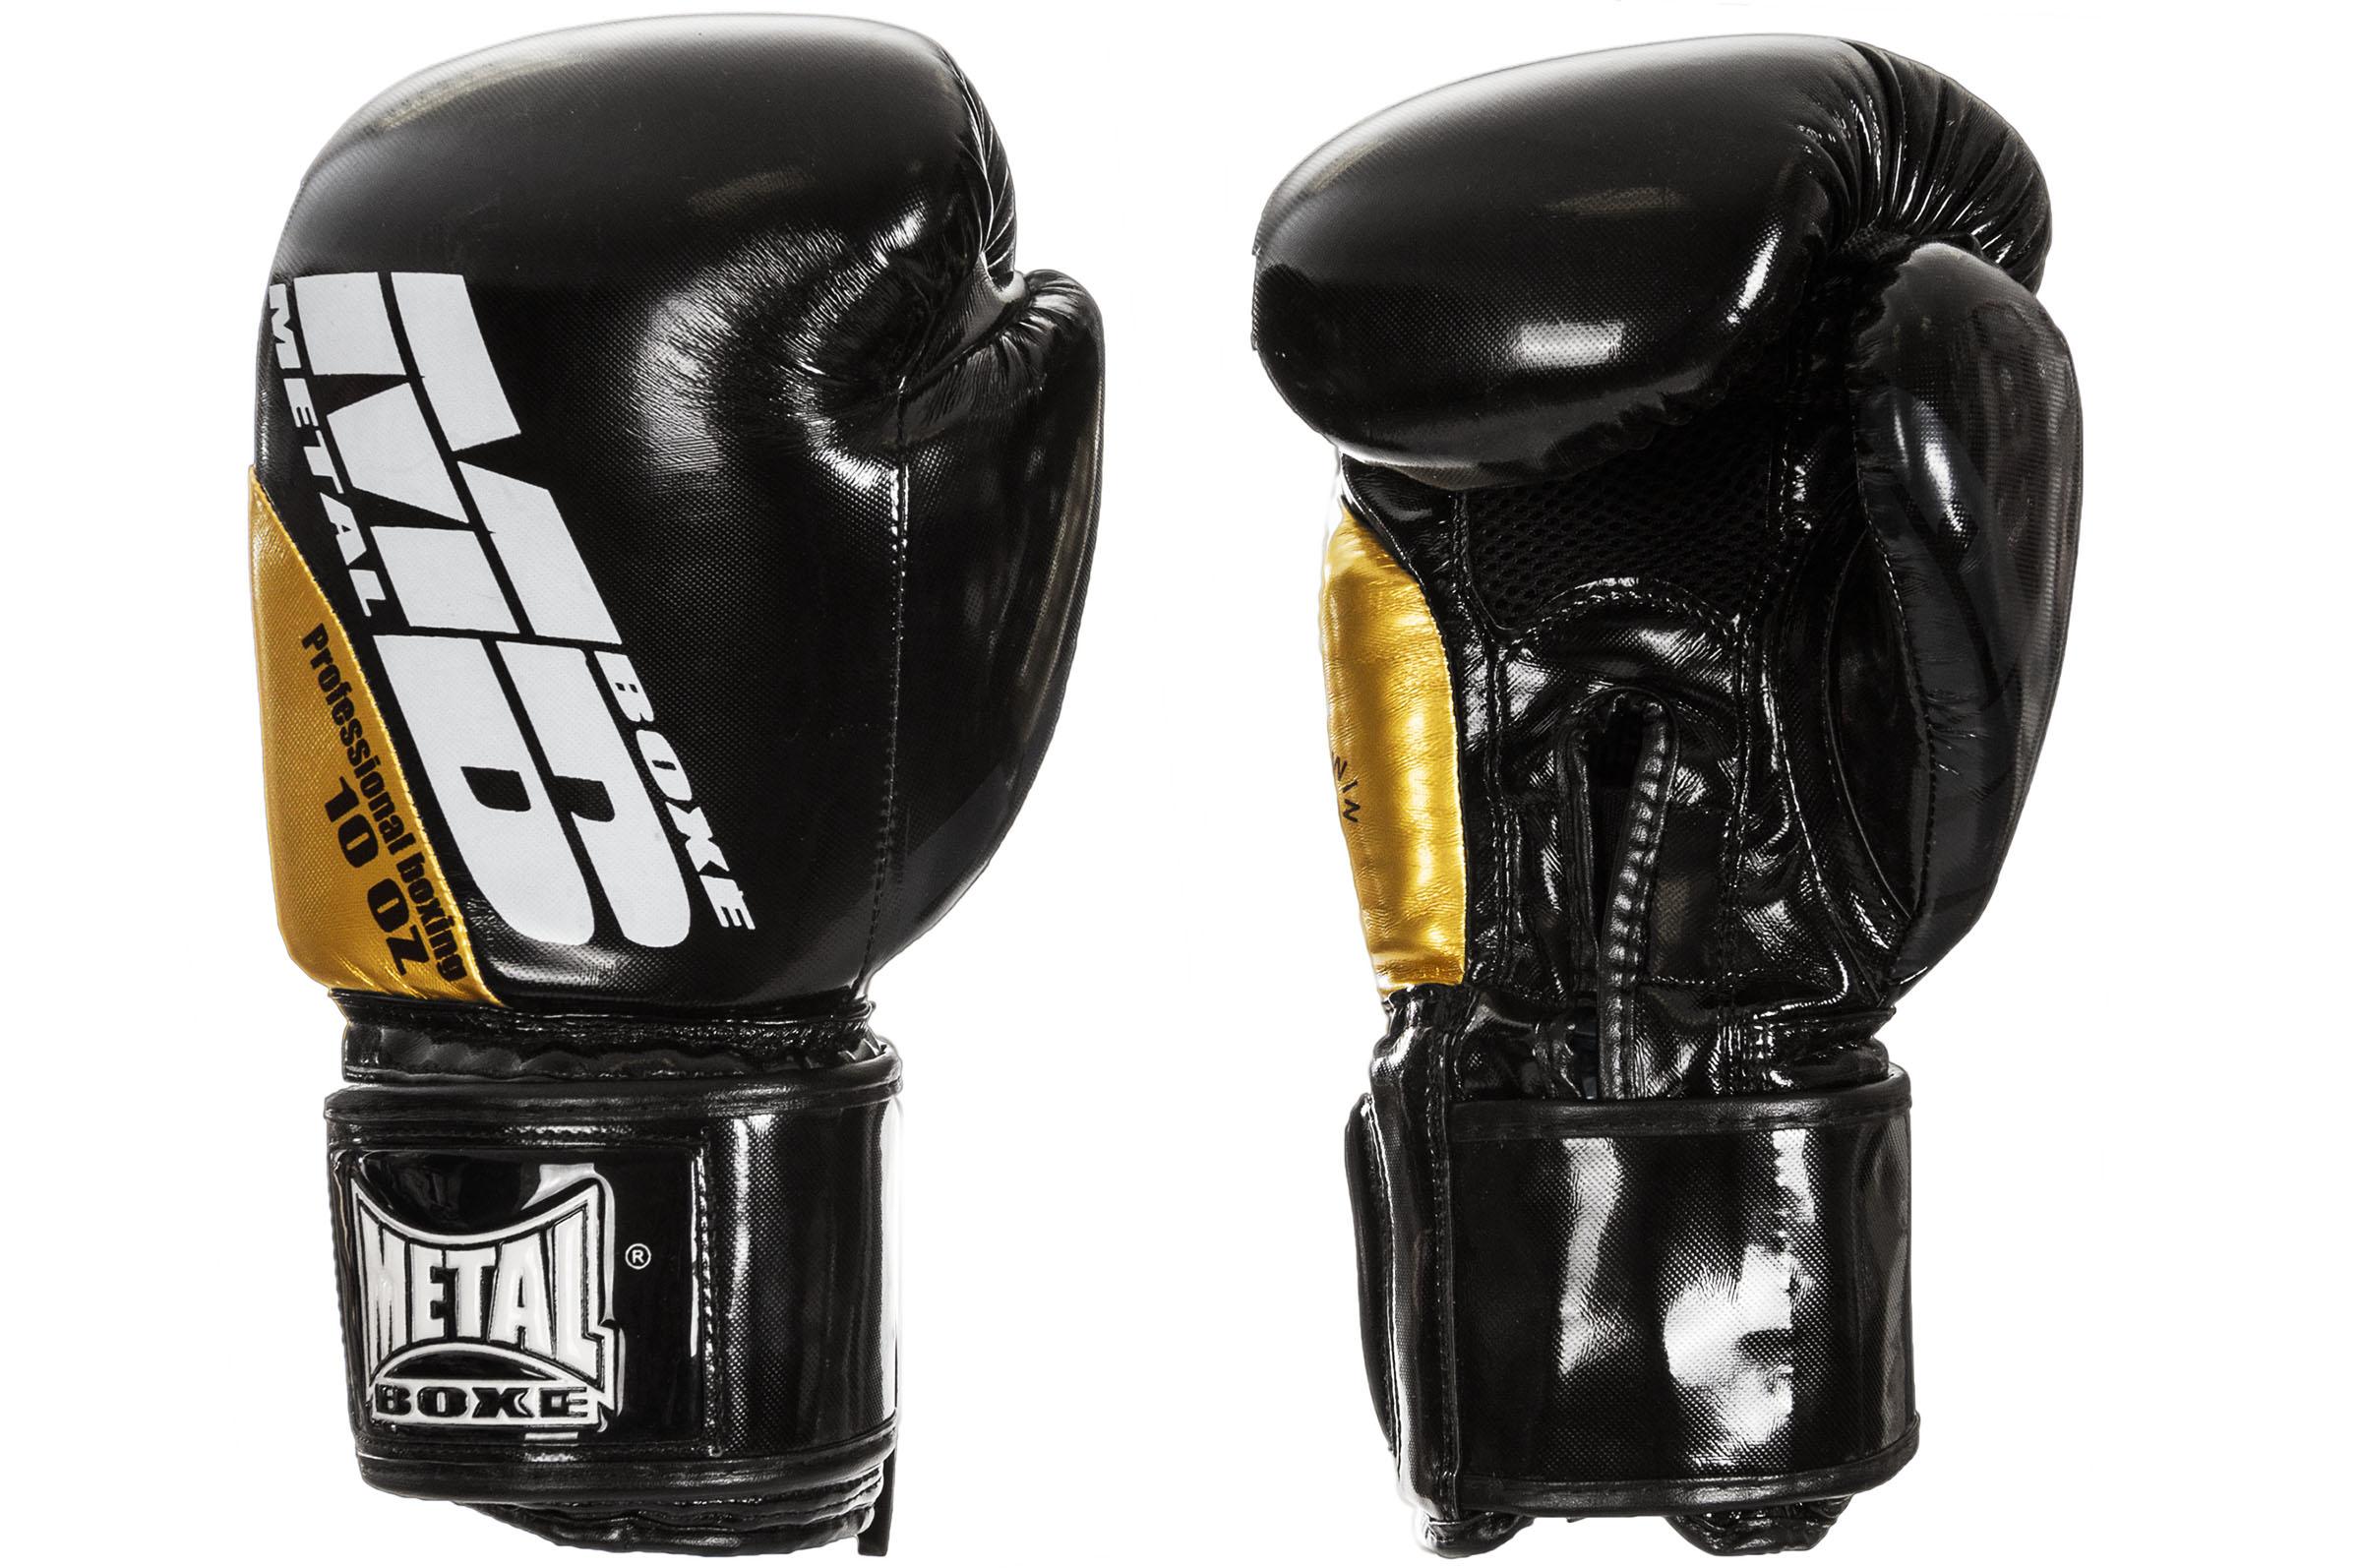 212b0bdafdb7 Destock  Gants de Compétition MB777, MetalBoxe - DragonSports.eu